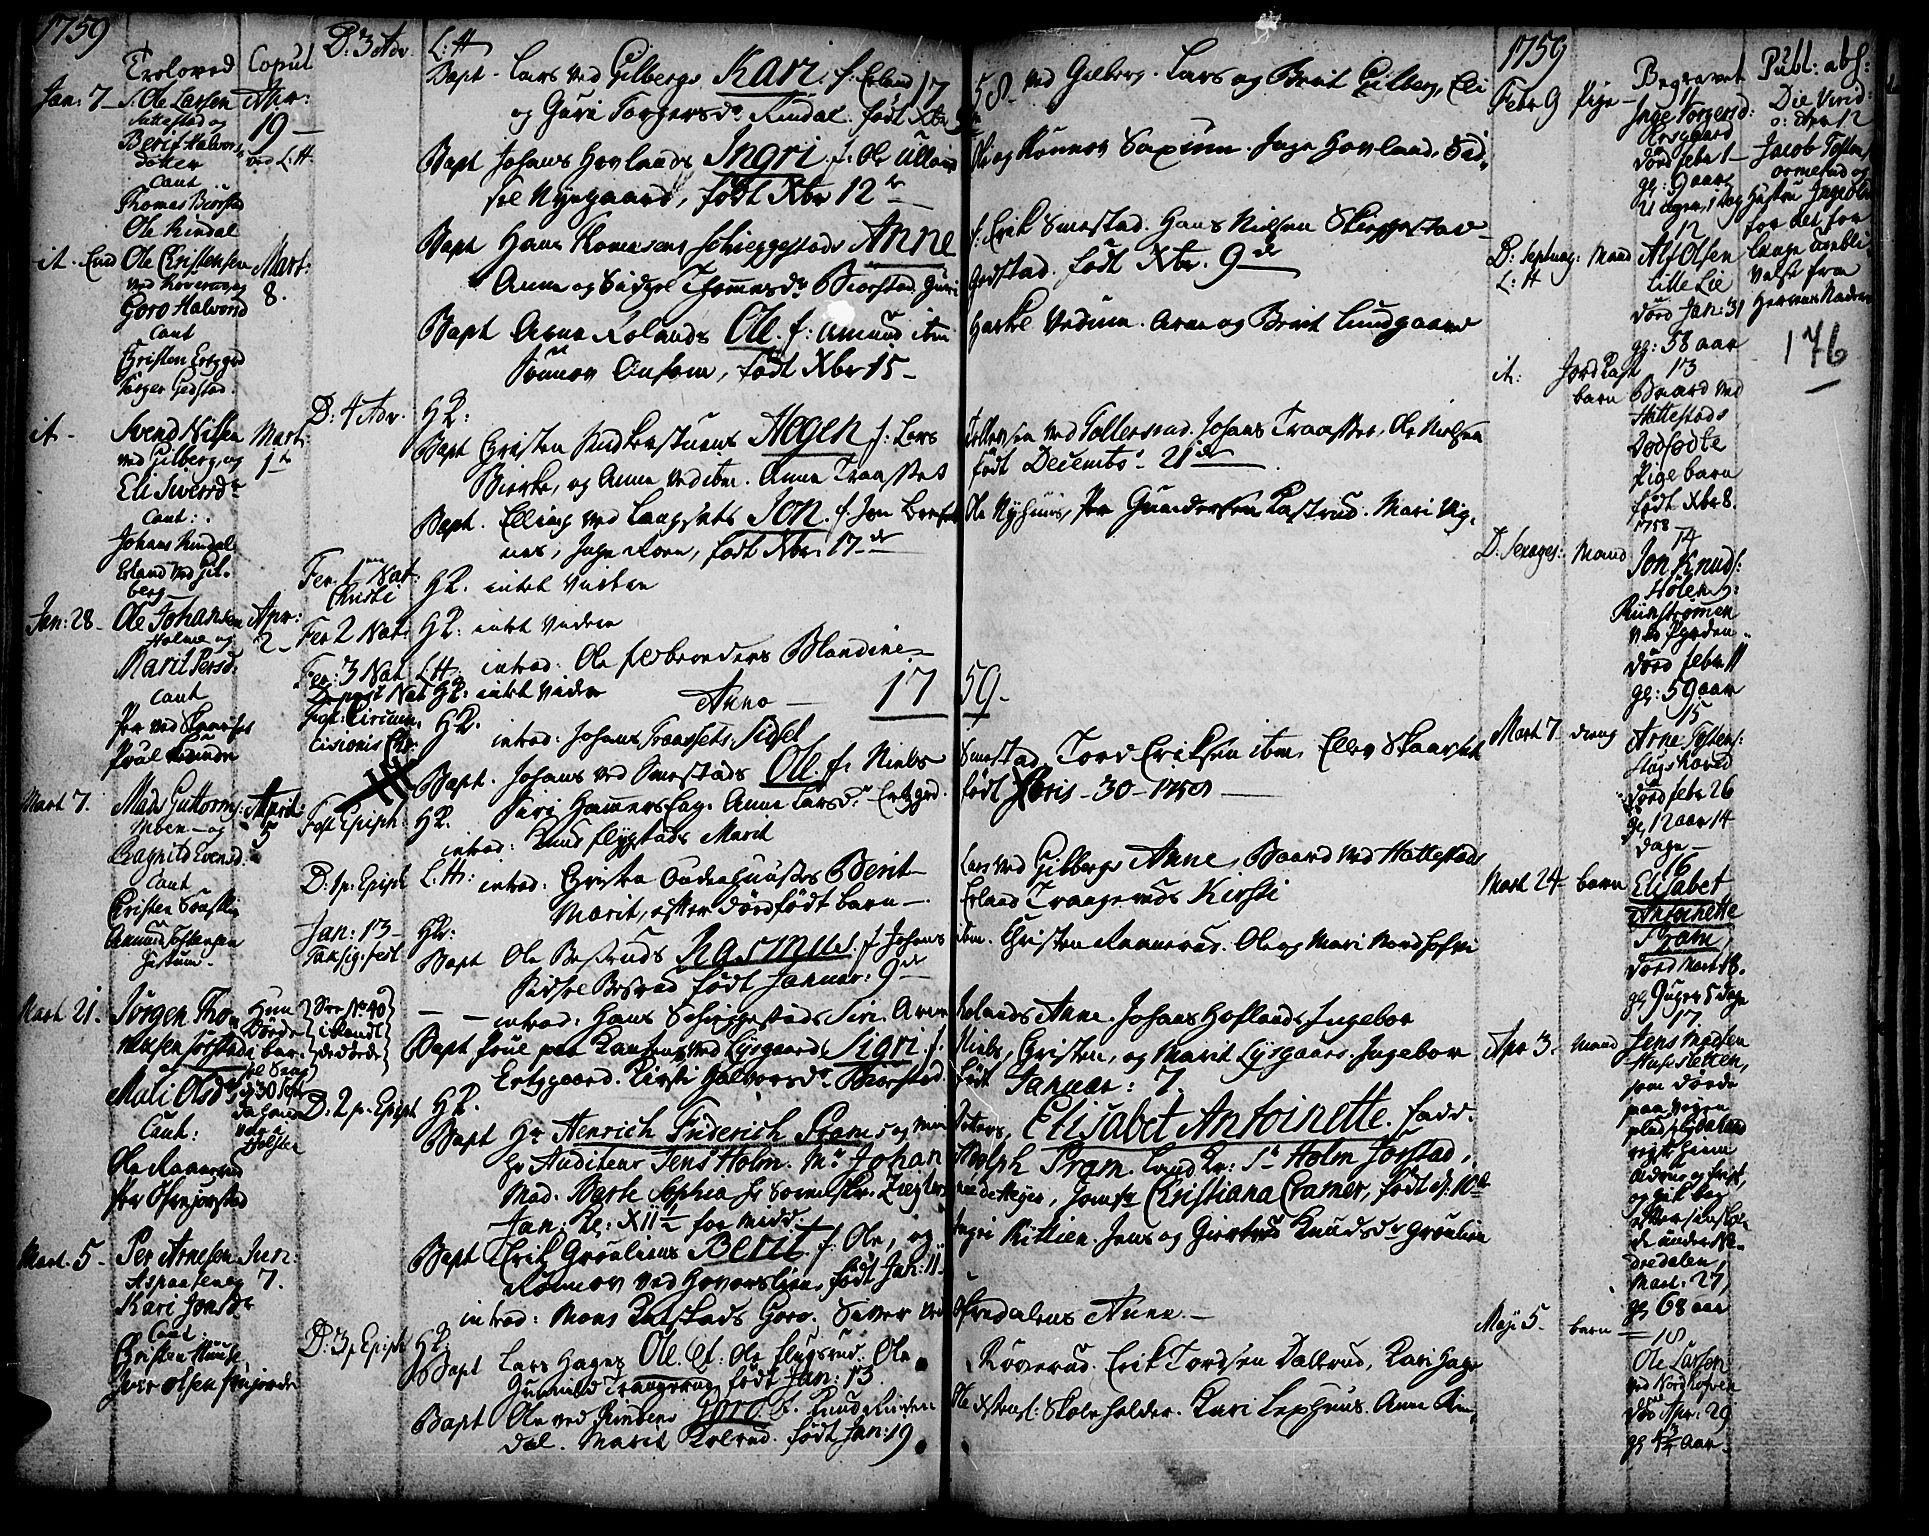 SAH, Fåberg prestekontor, Ministerialbok nr. 1, 1727-1775, s. 176